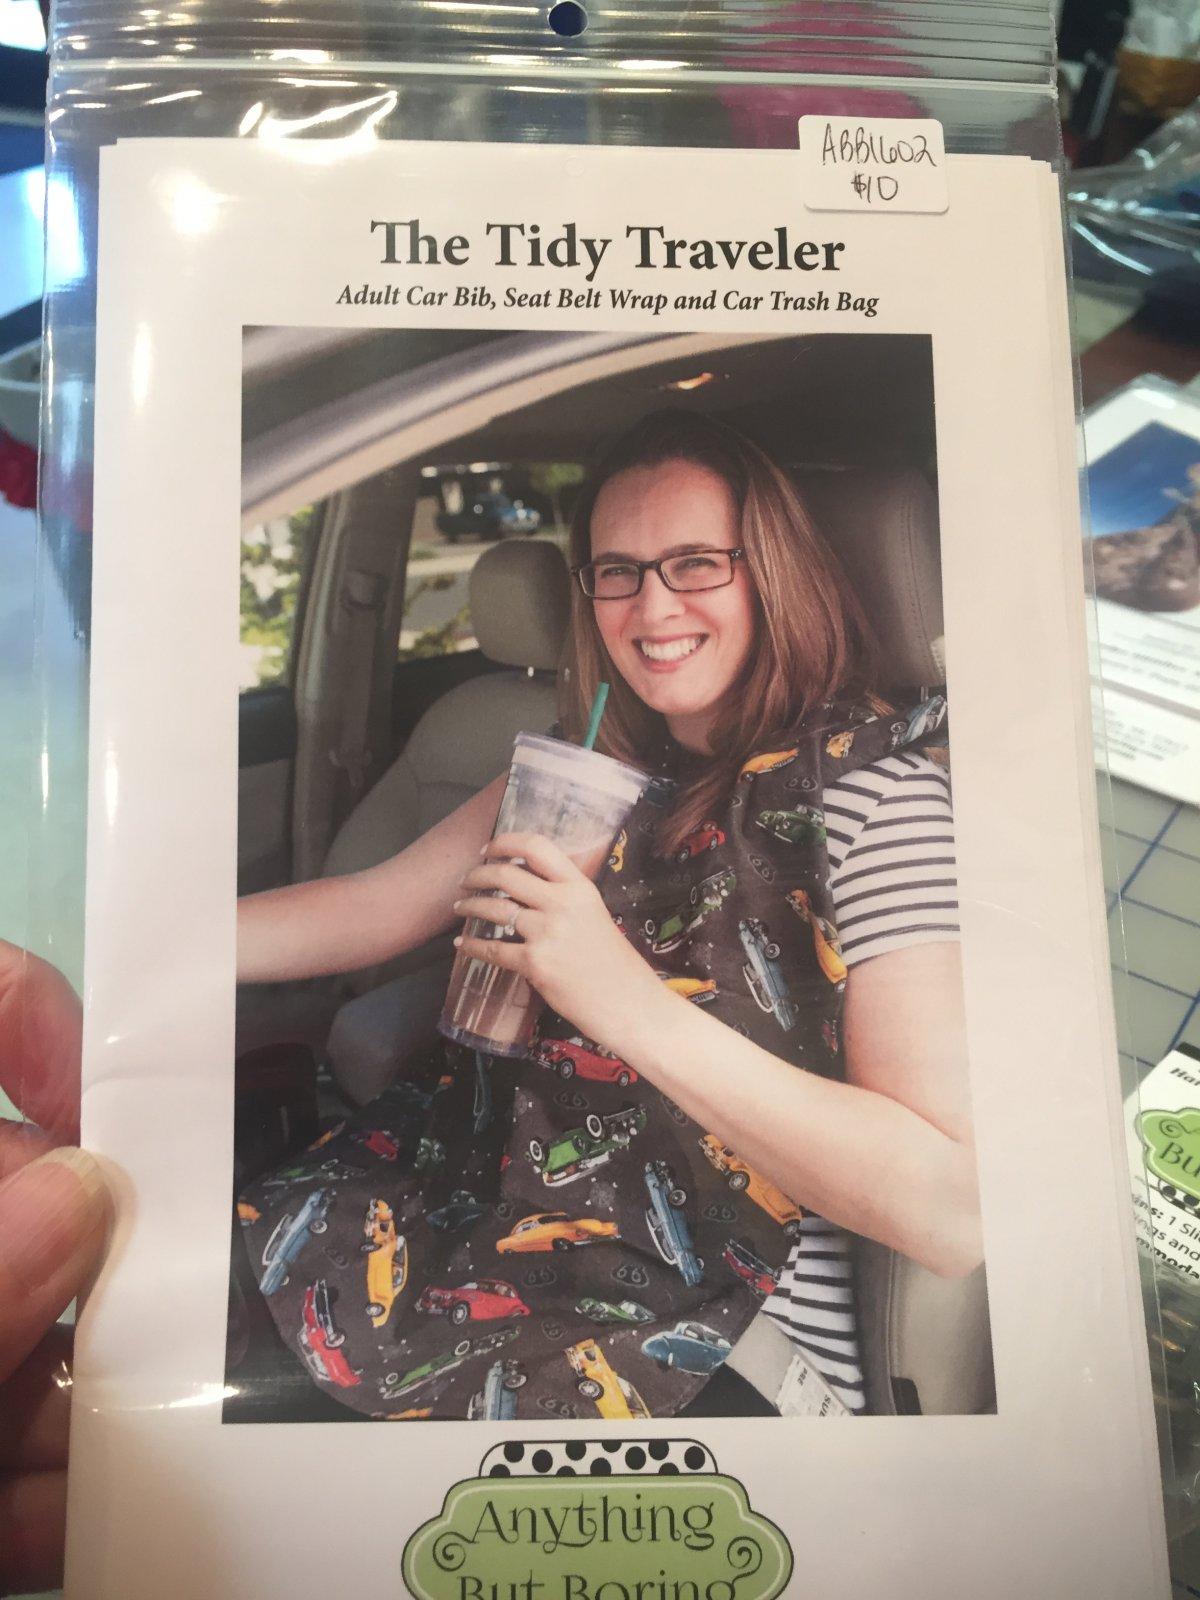 The Tidy Traveler